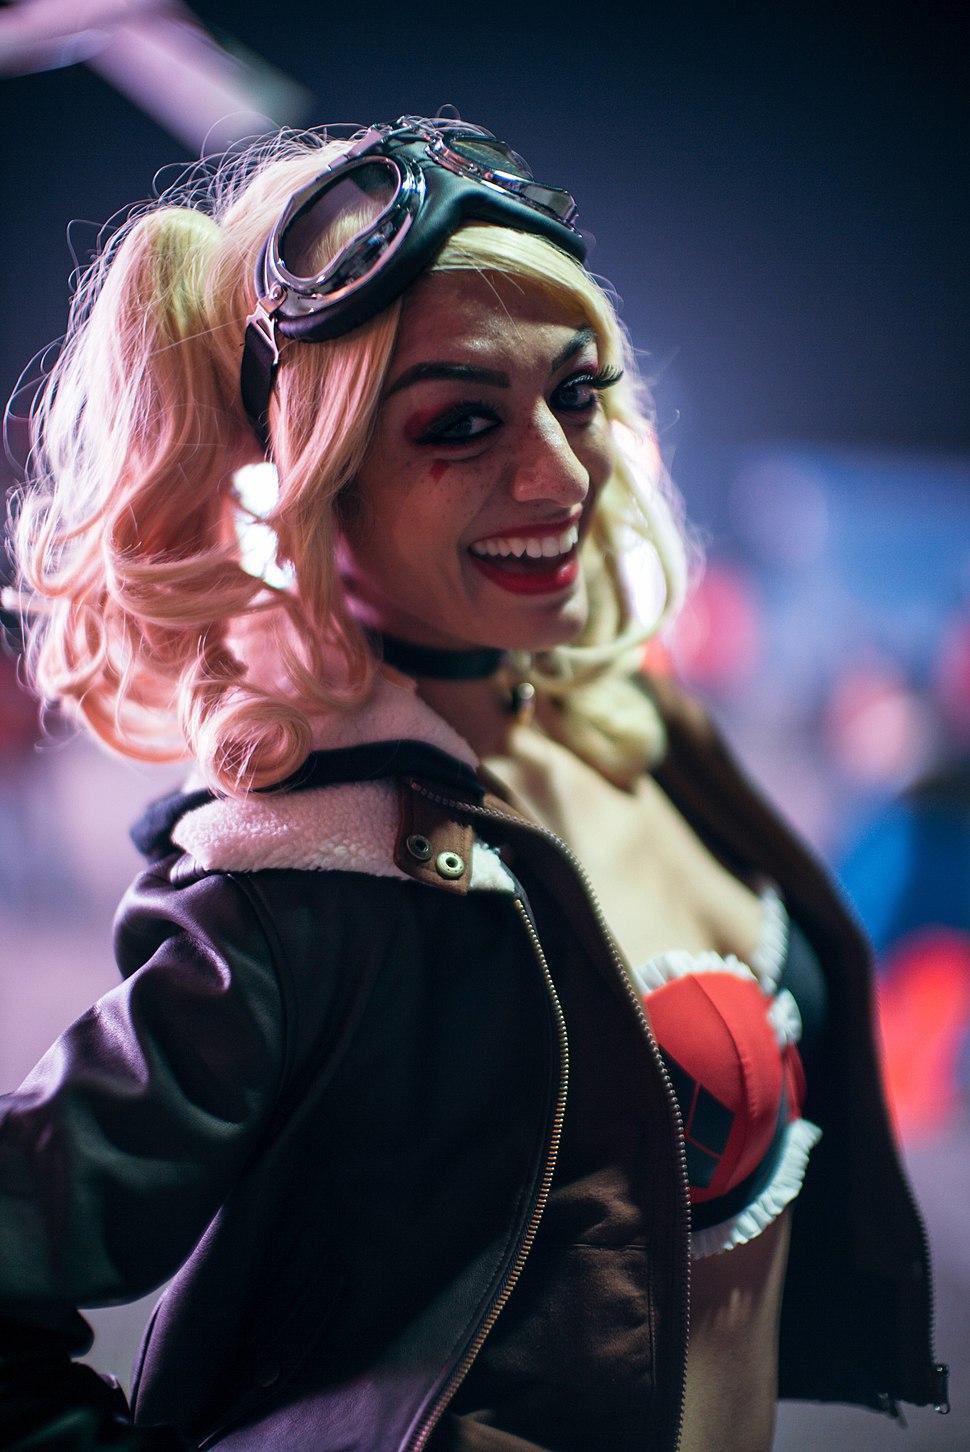 Bombshell Harley Quinn Cosplay